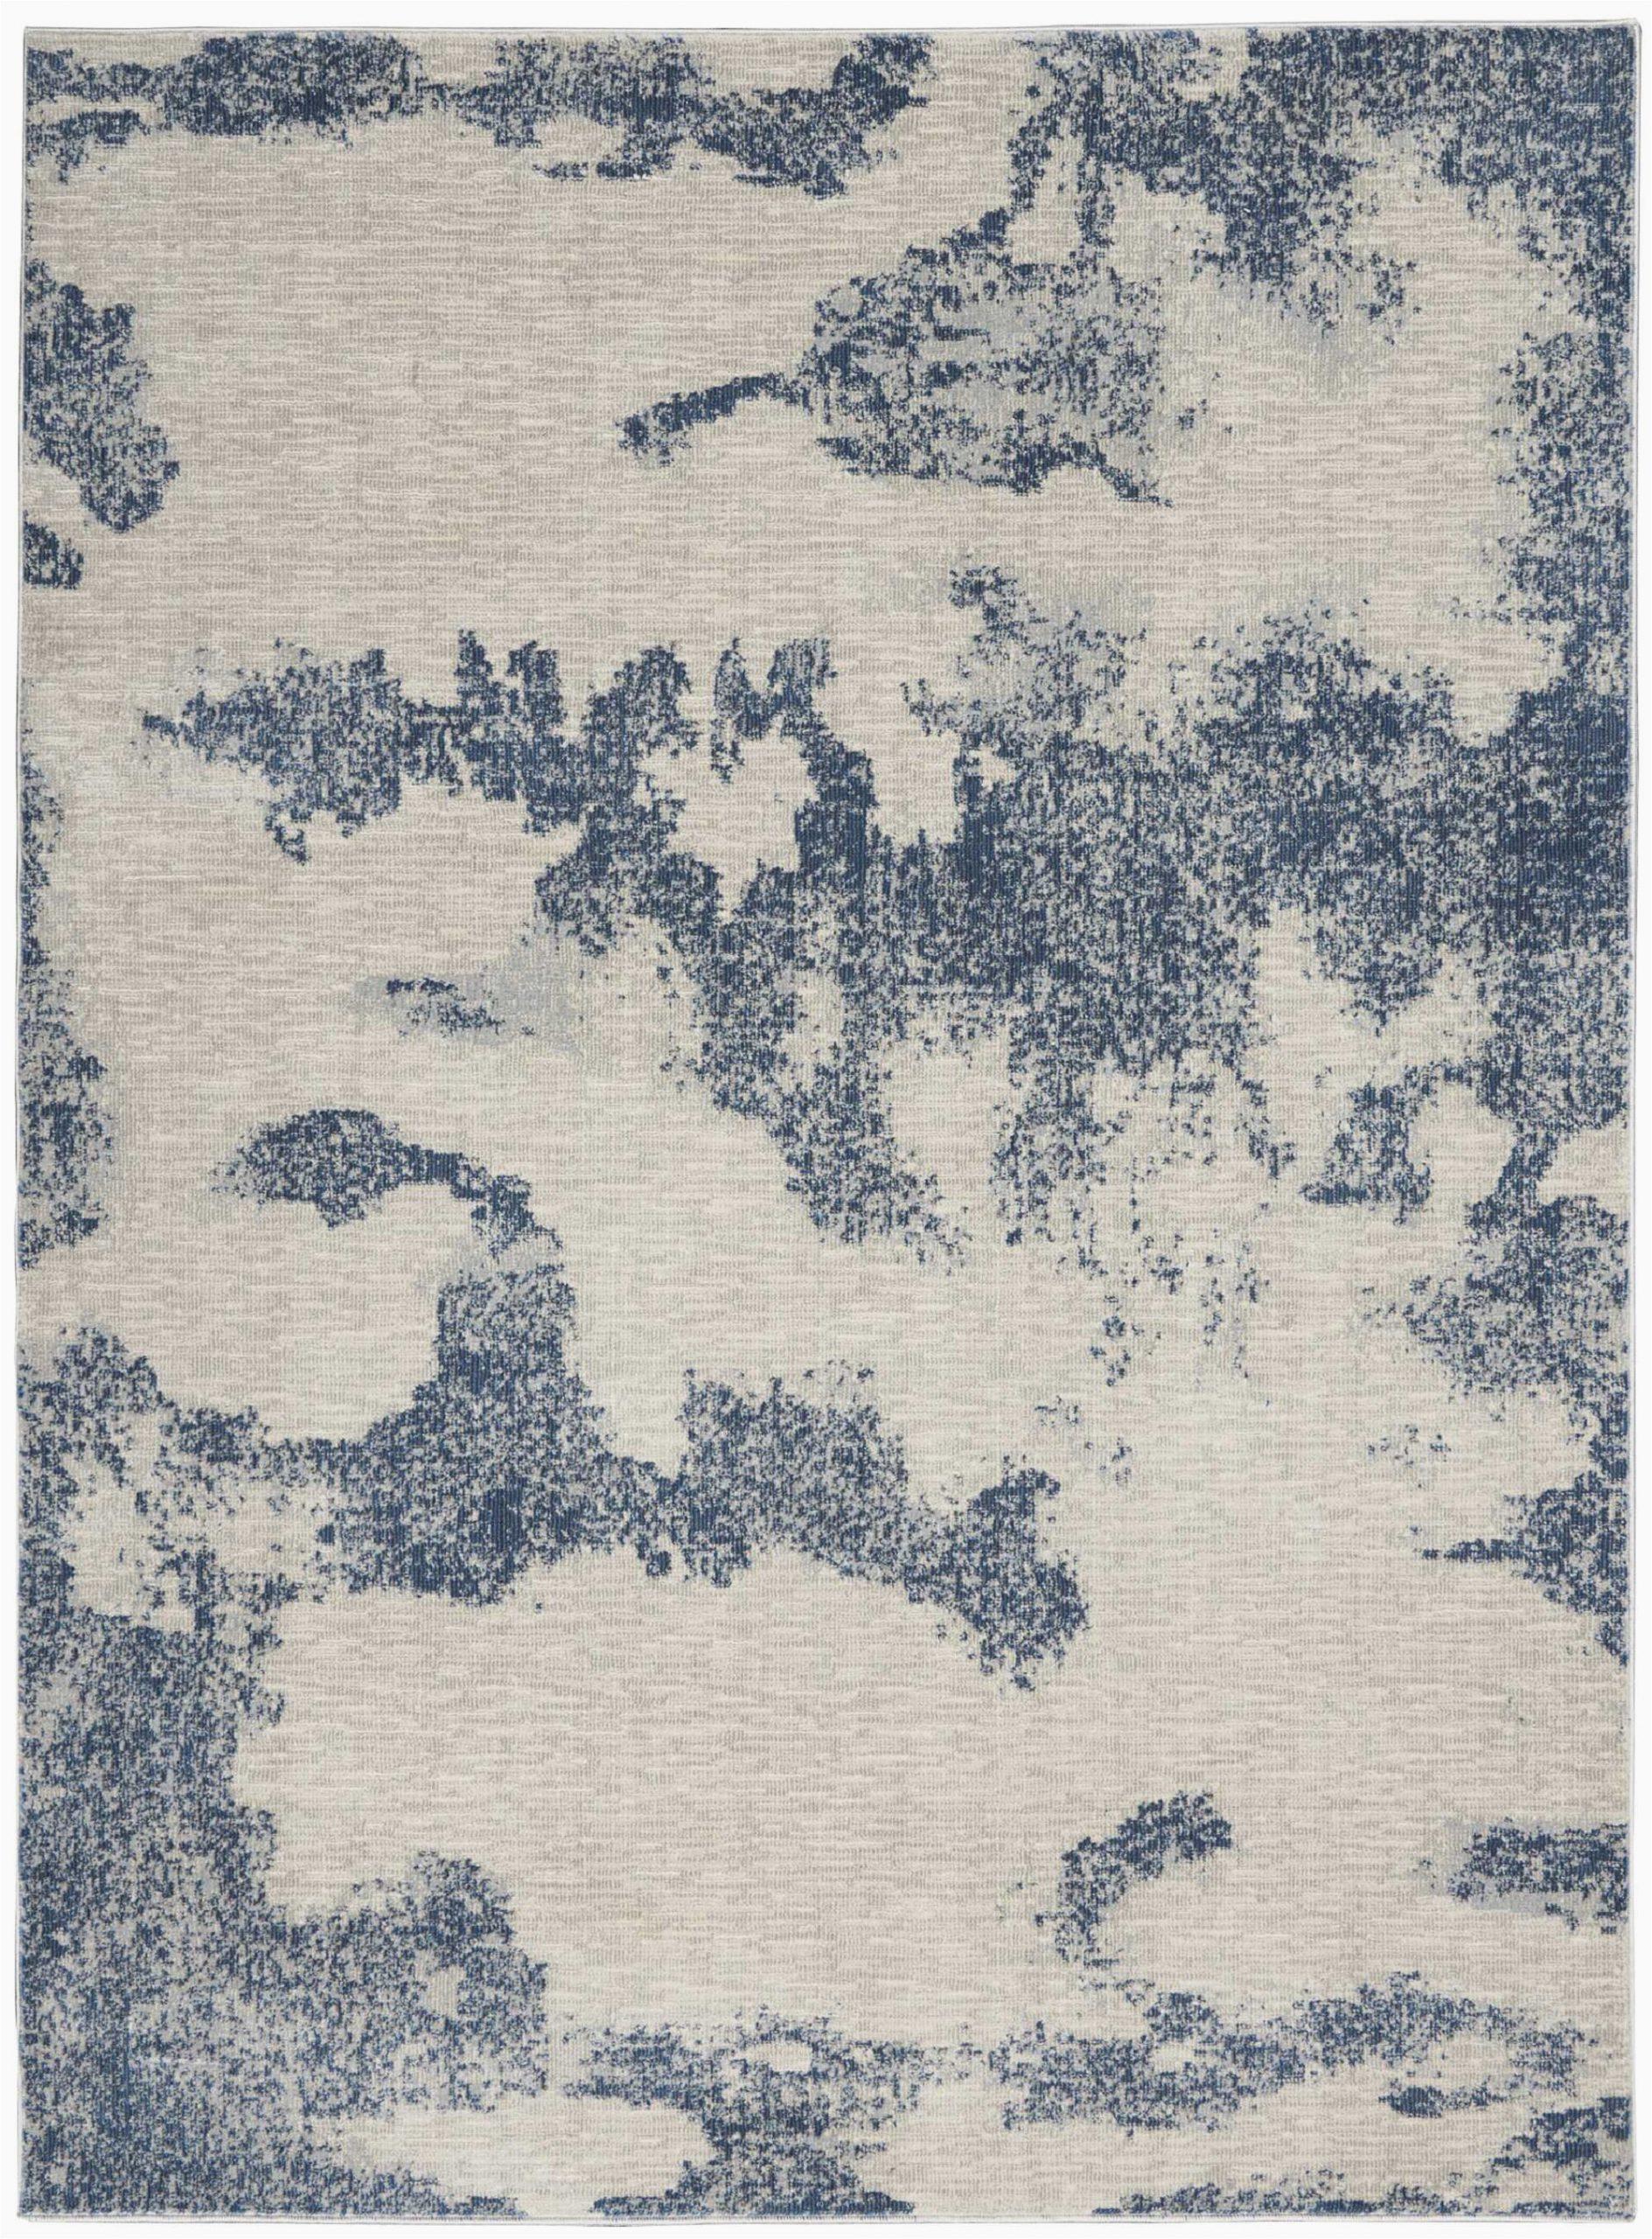 schooley abstract ivorynavy blue area rug